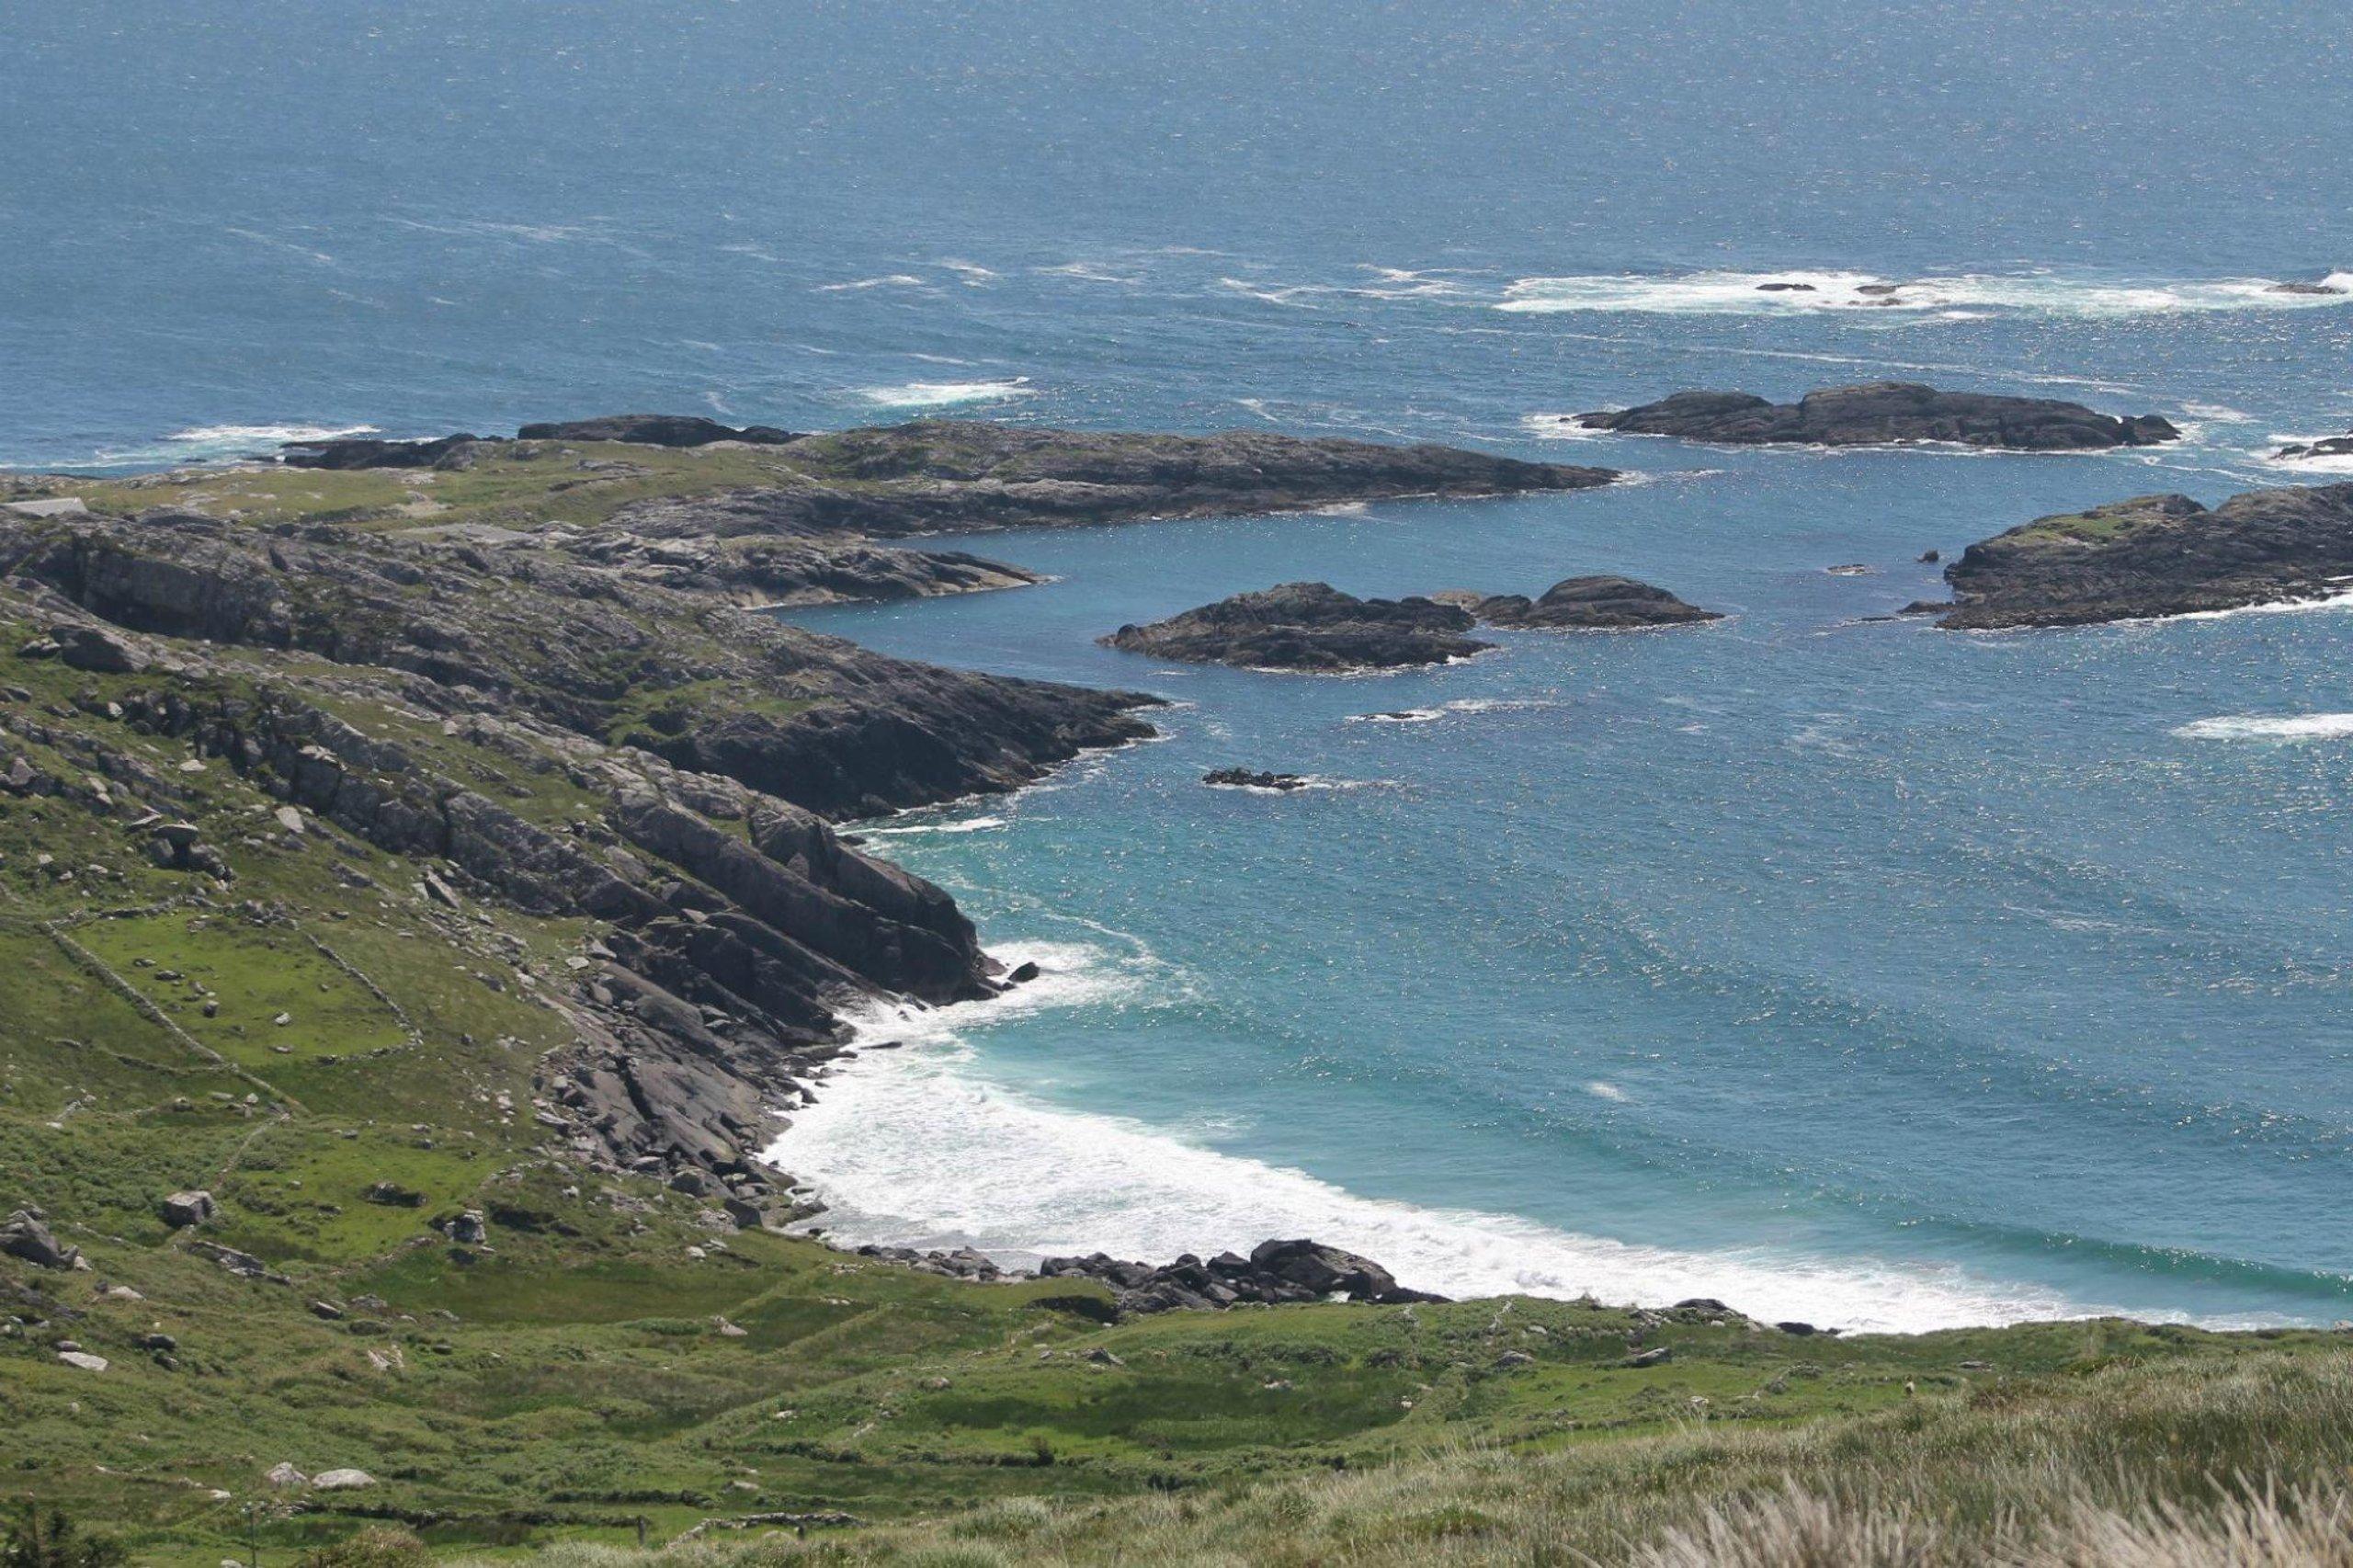 Killarney to The Strand @ Inch Beach - 4 ways to travel via